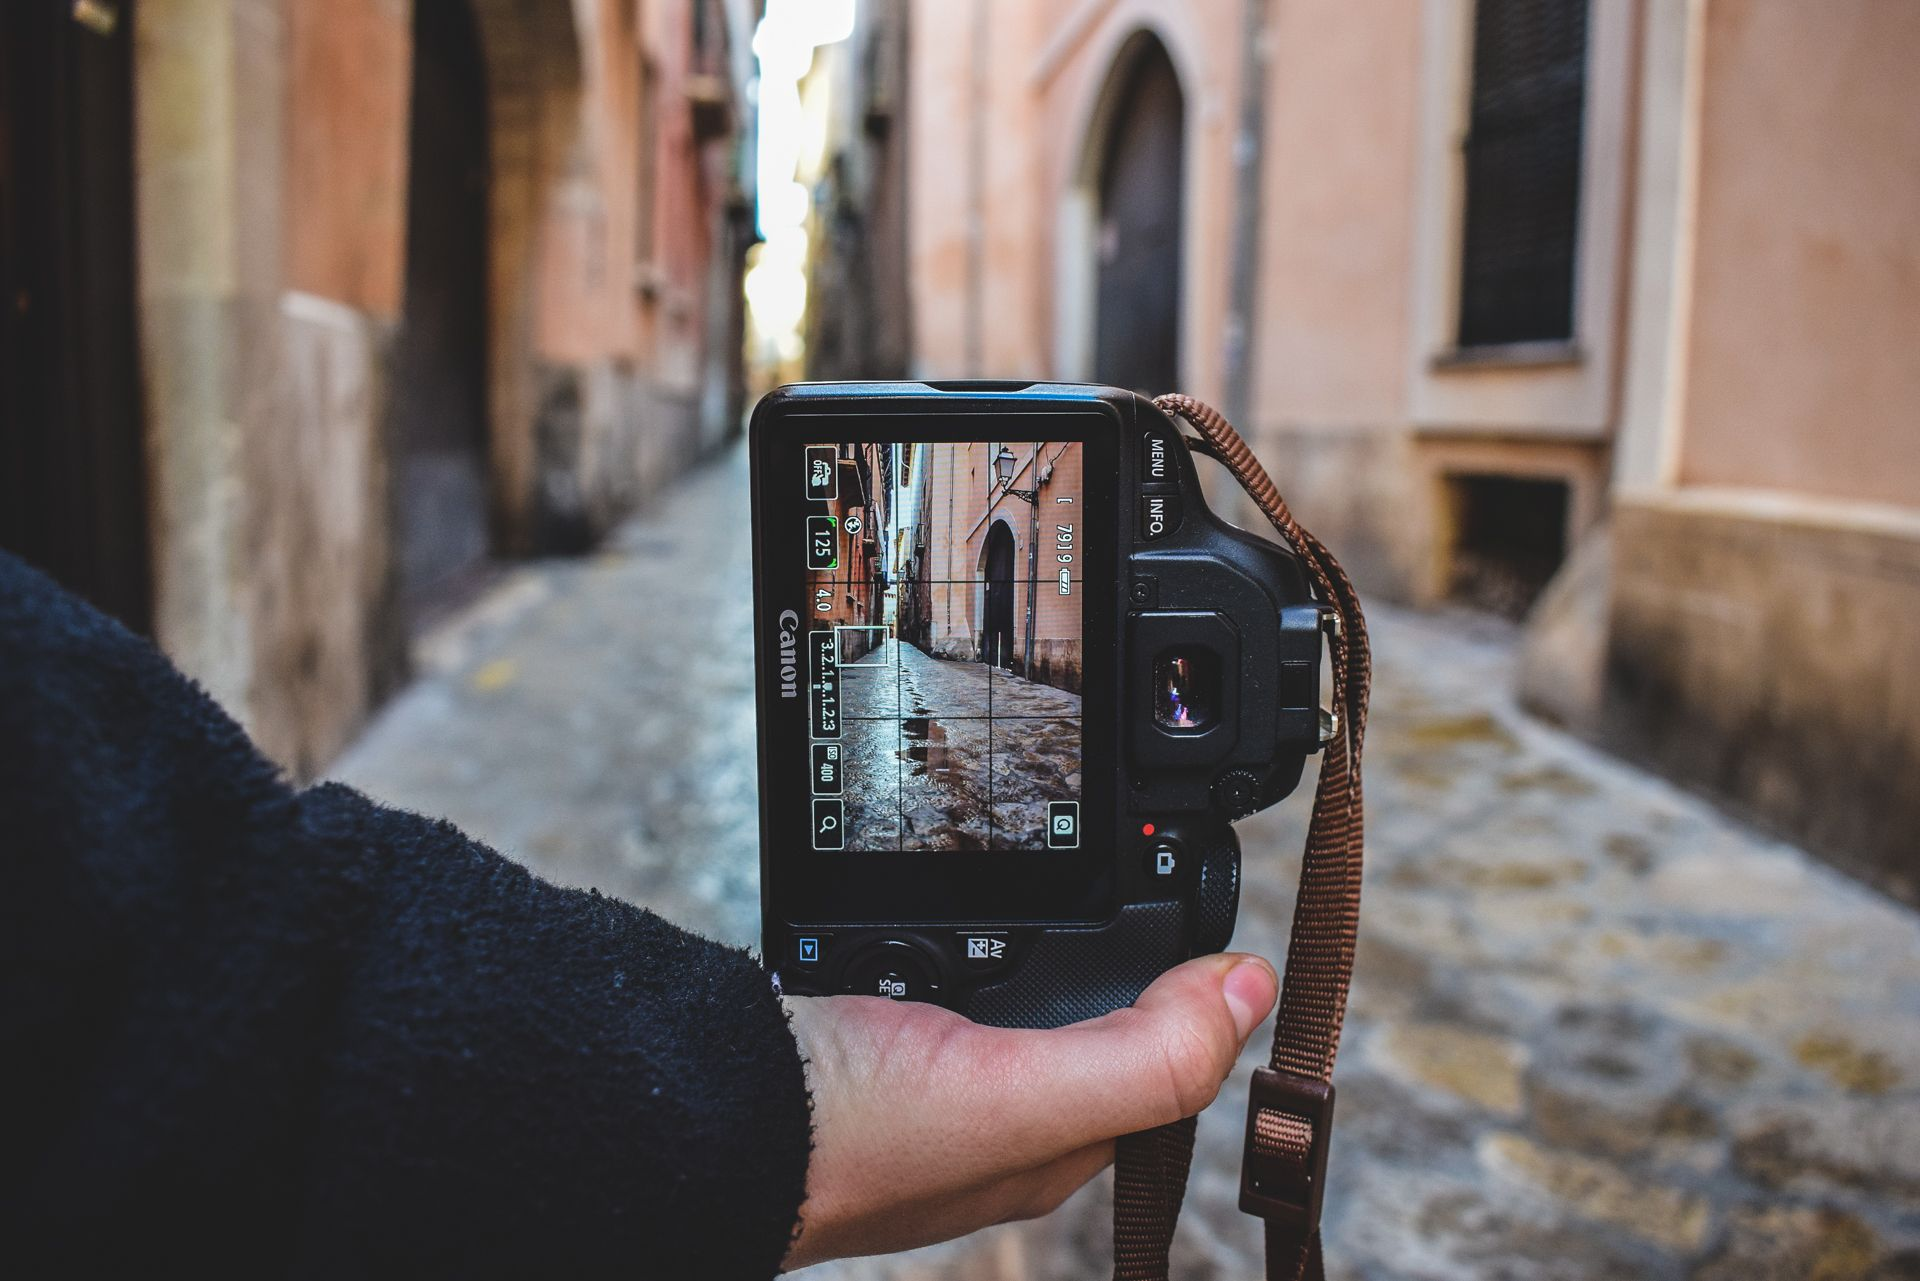 Palma Tourism Chief optimistic for Mallorca Travel rebound